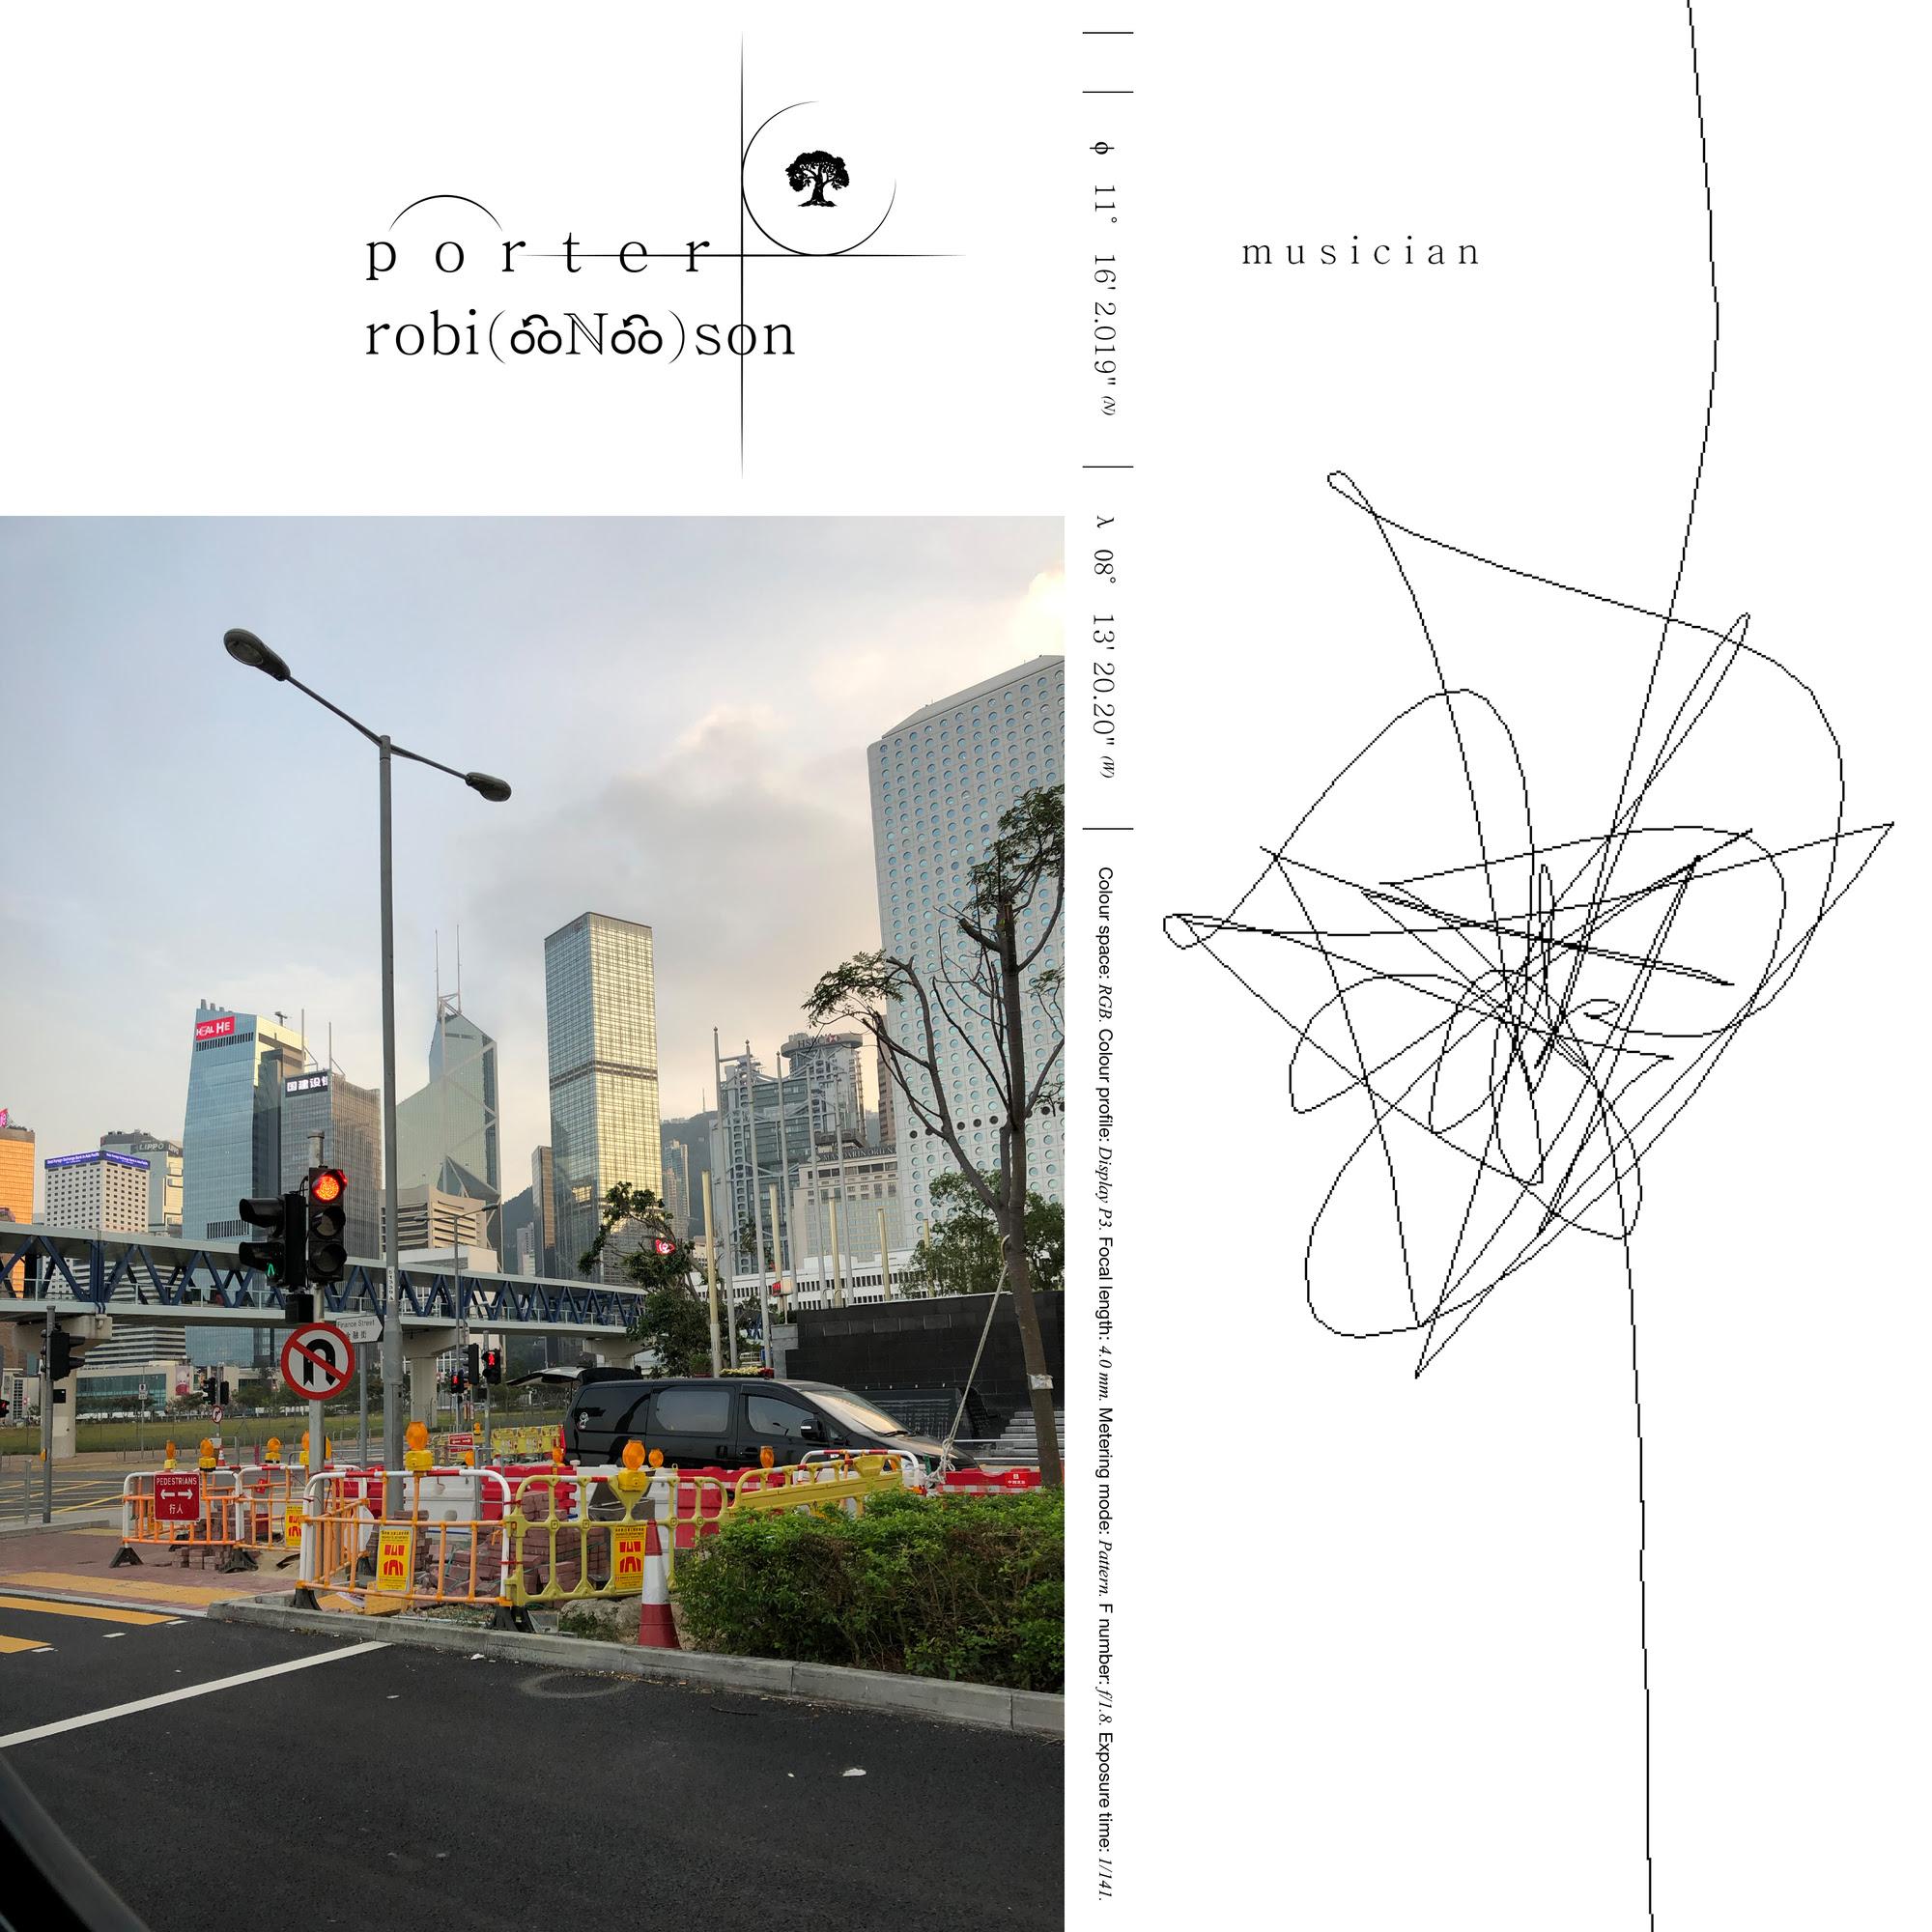 Musician - Porter Robinson Cover Art